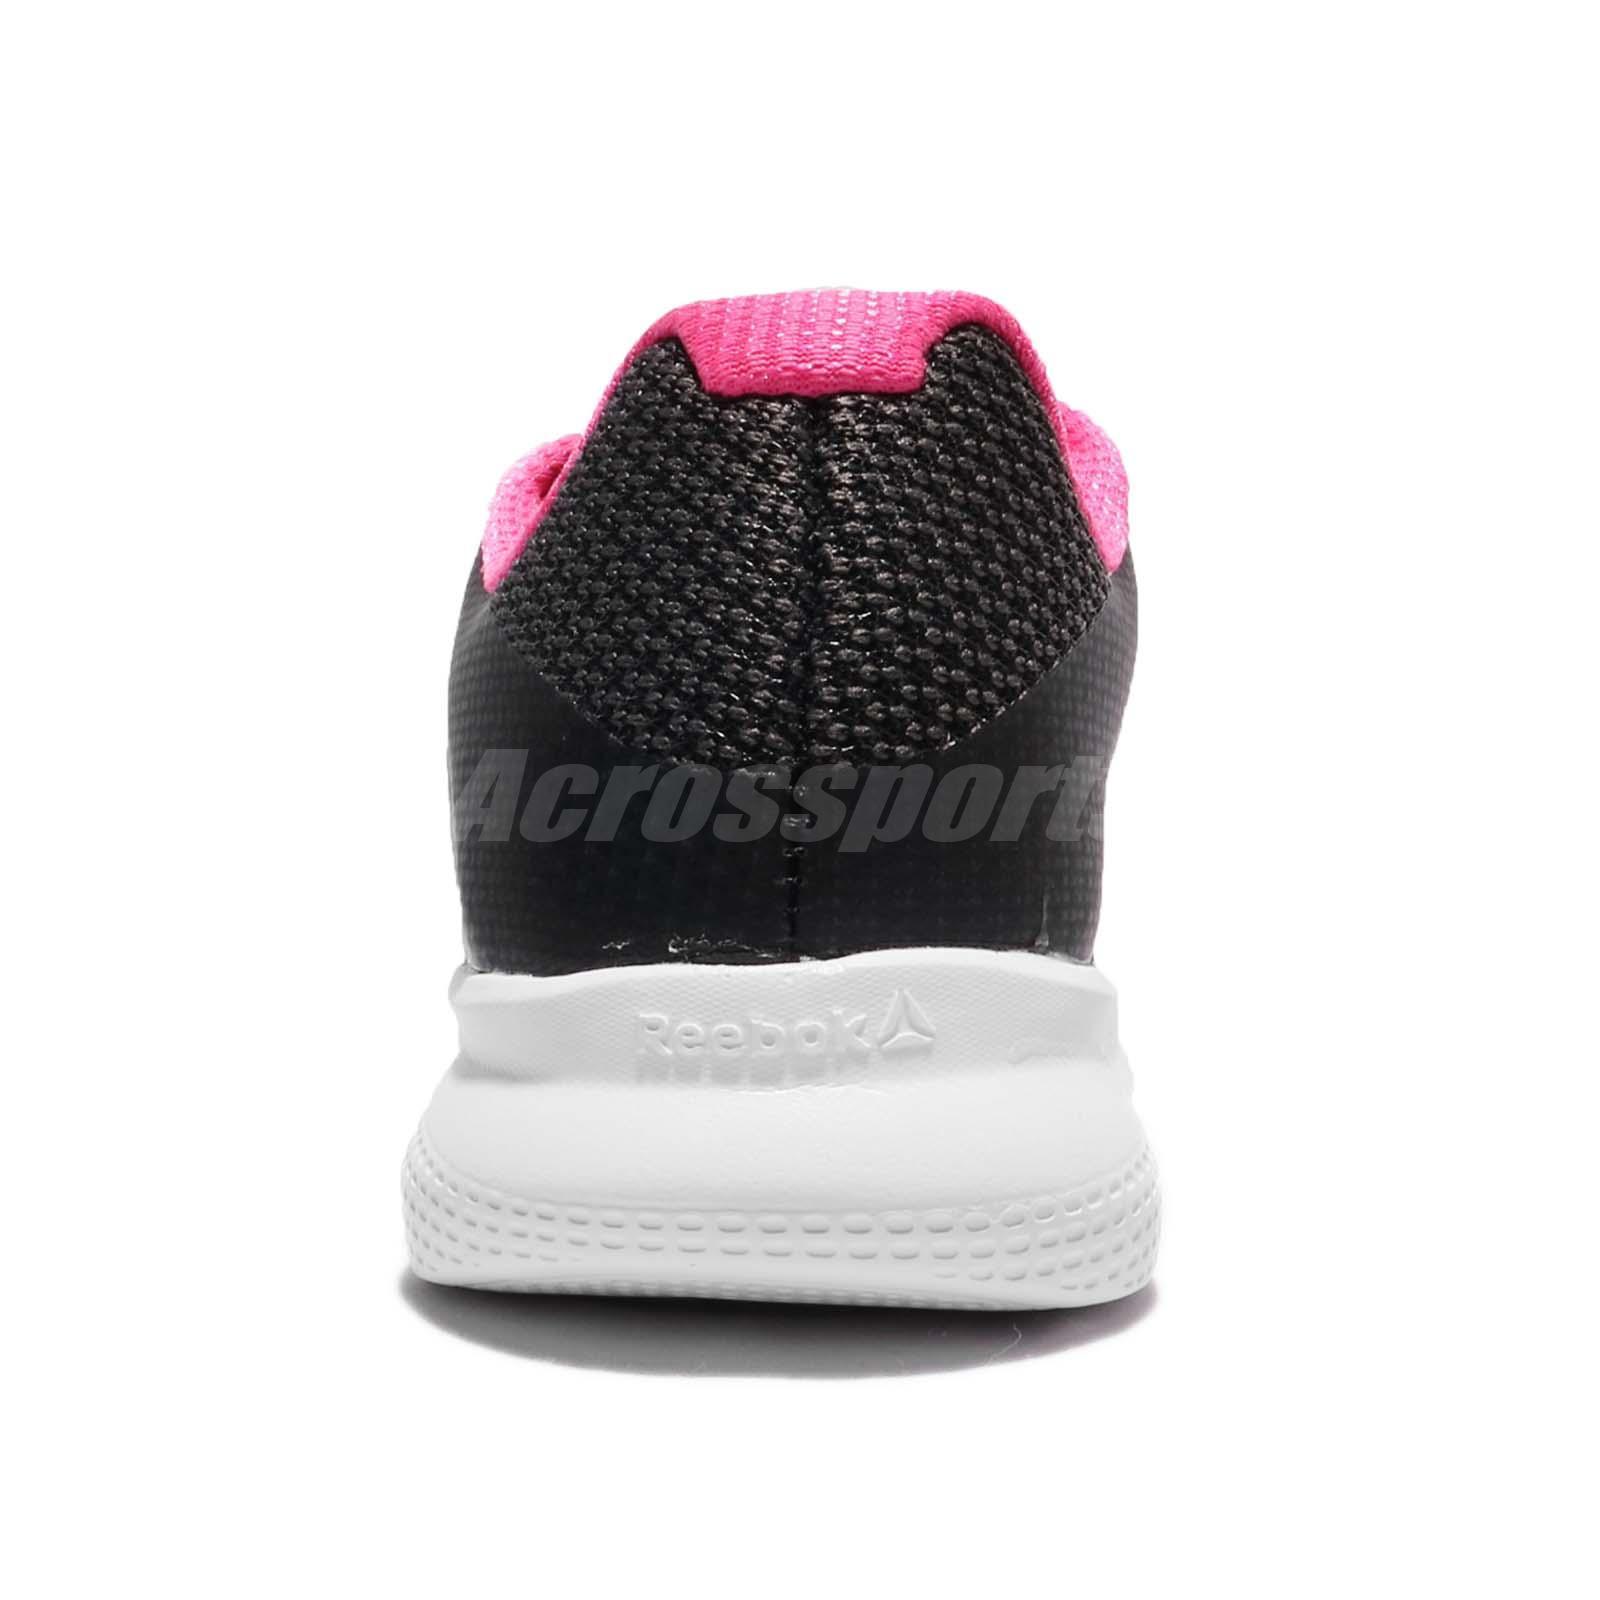 db3369b061d6 Reebok Instalite Run Black White Pink Women Running Shoes Sneakers ...